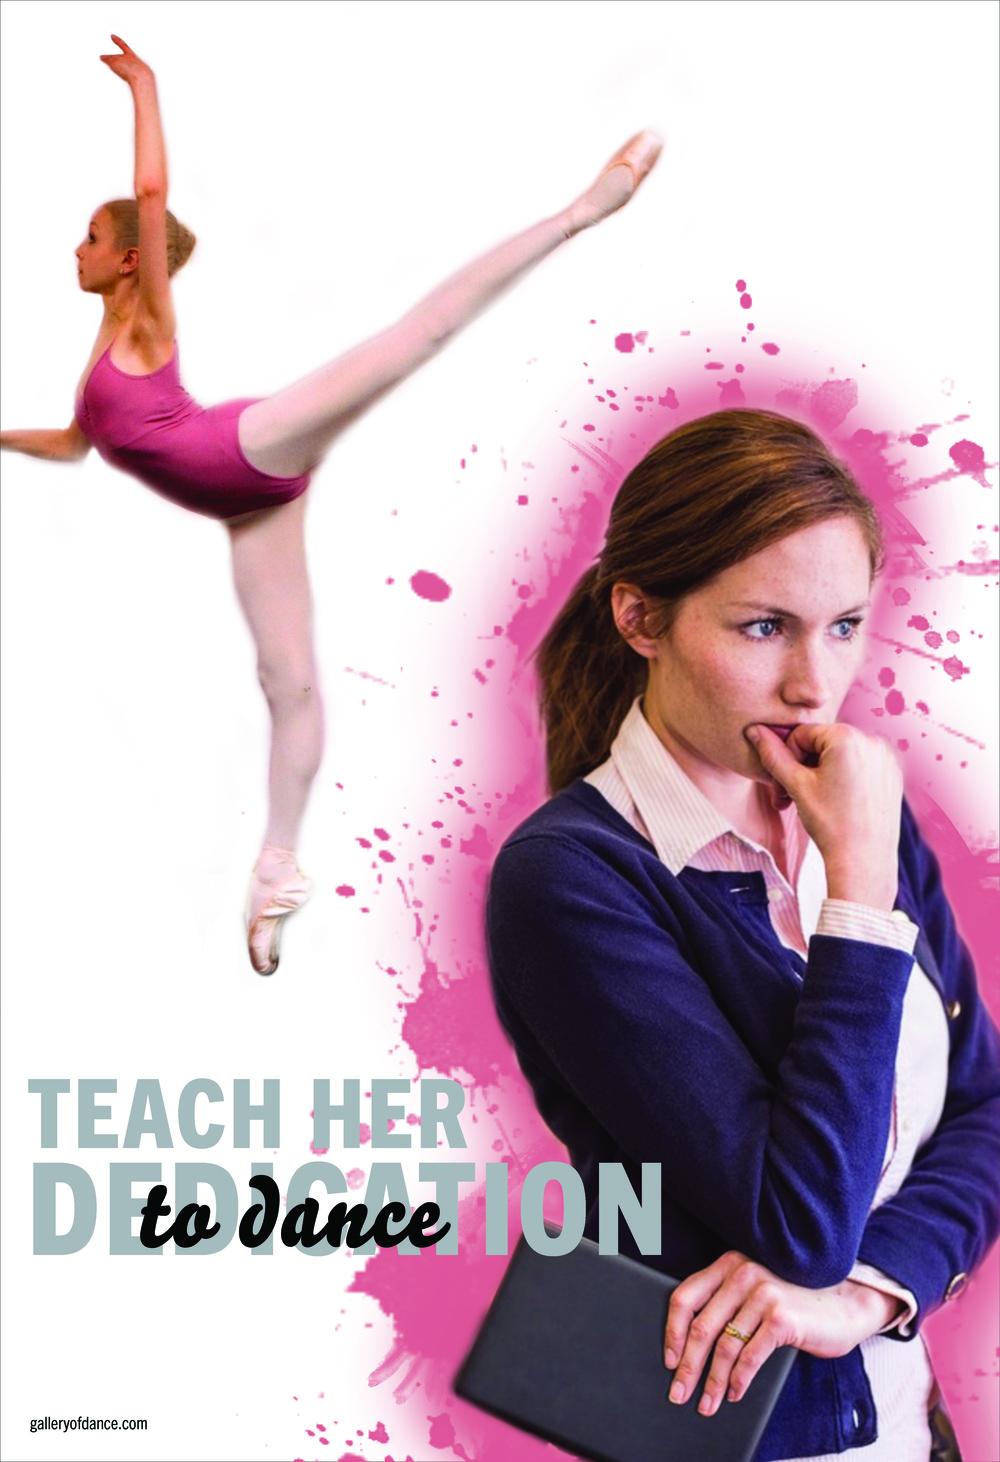 teachherdedication.jpg